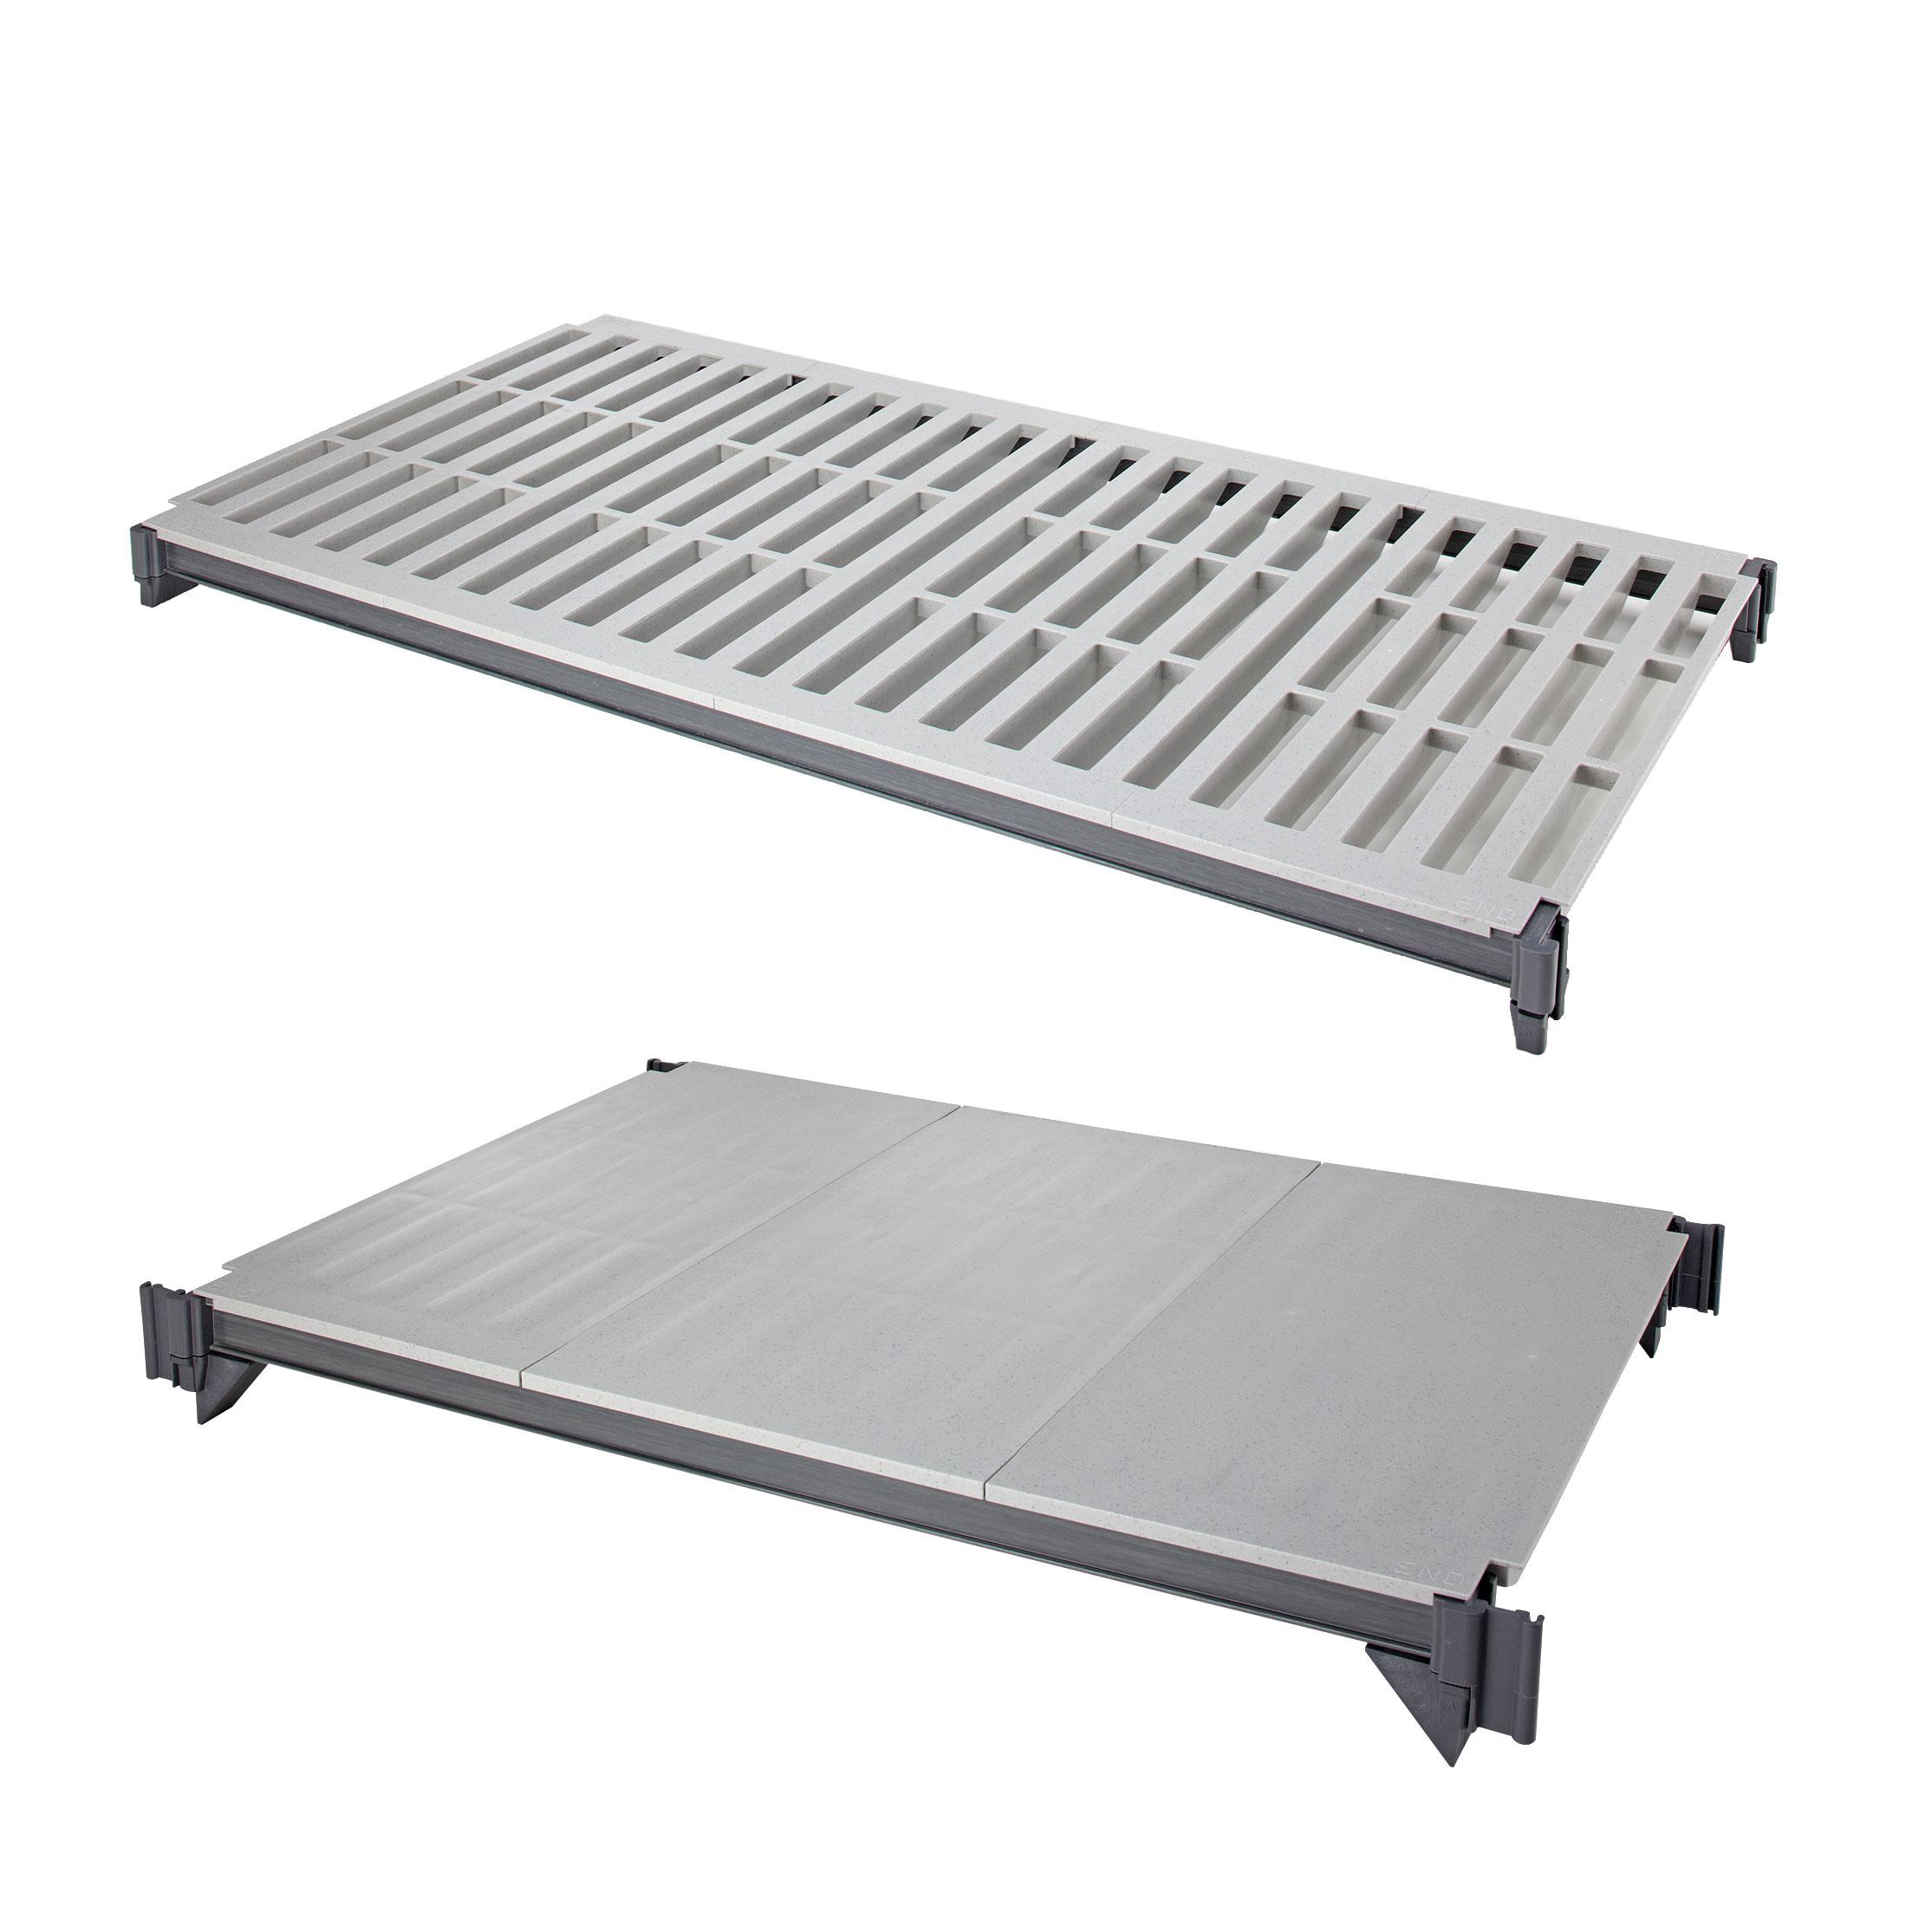 Cambro CBSK1842VS5580 shelving/shelving systems